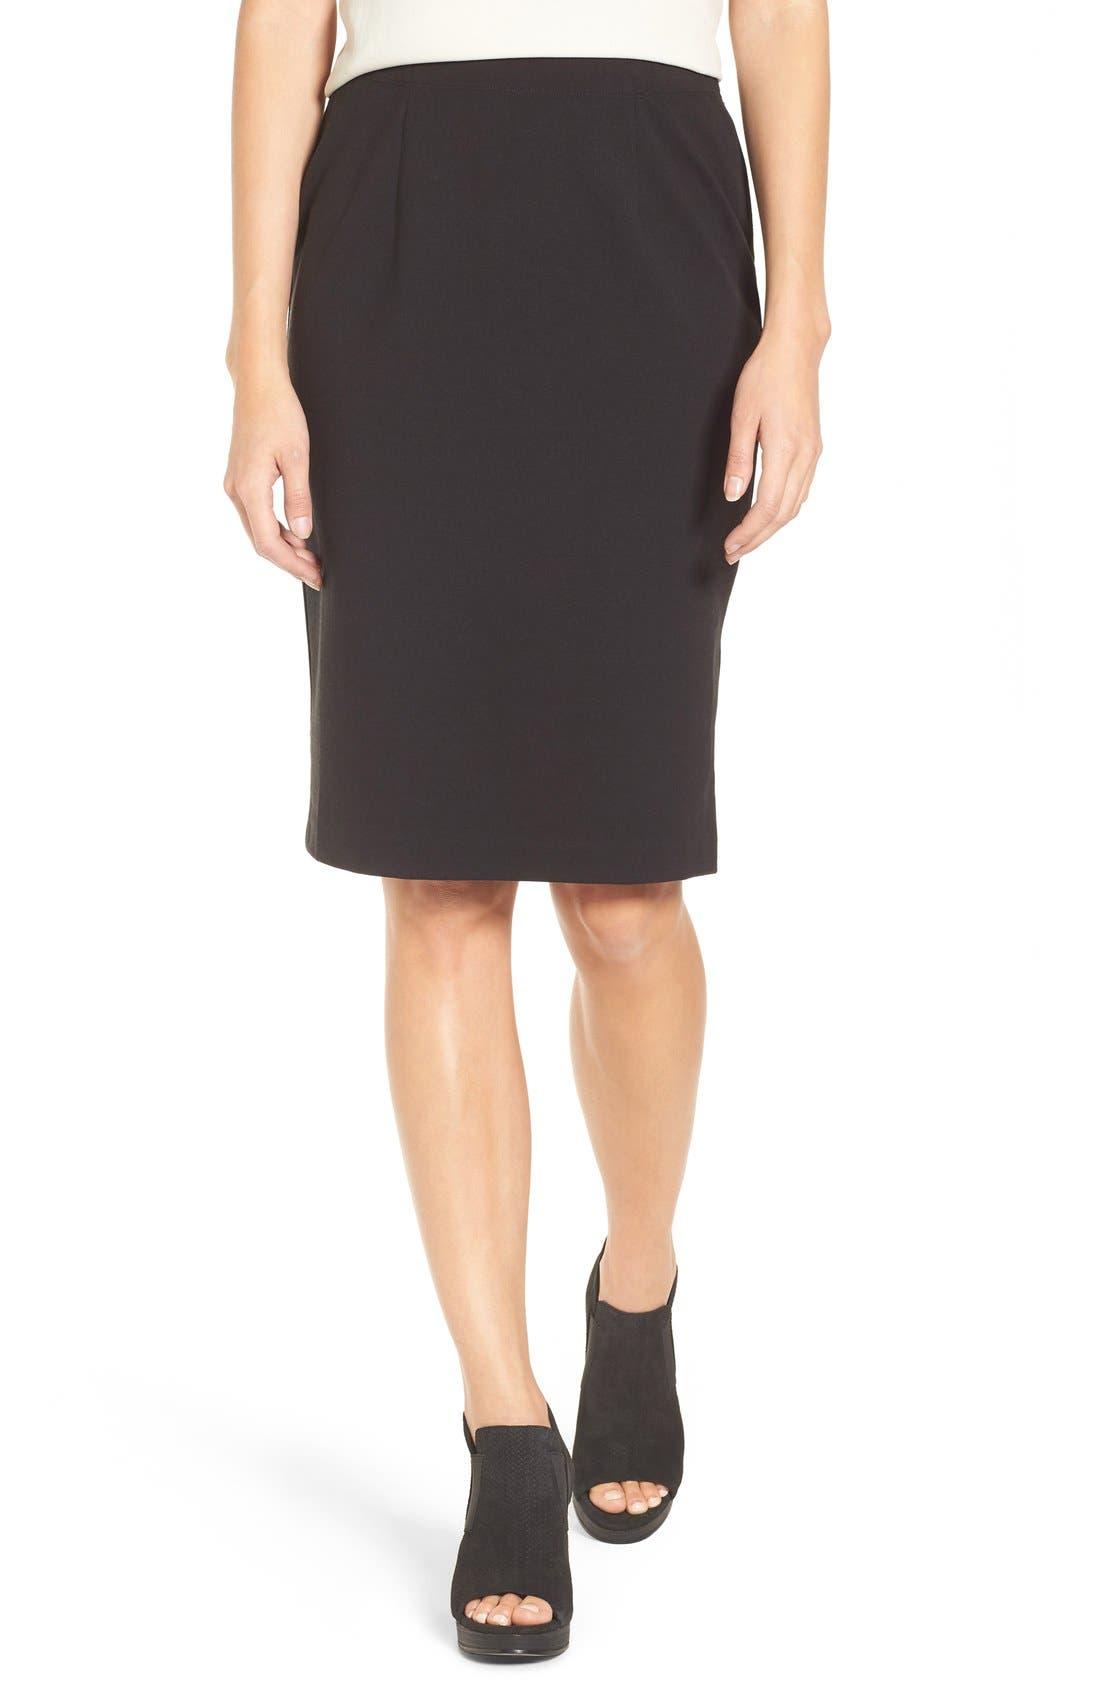 Eileen Fisher Stretch Ponte Pencil Skirt